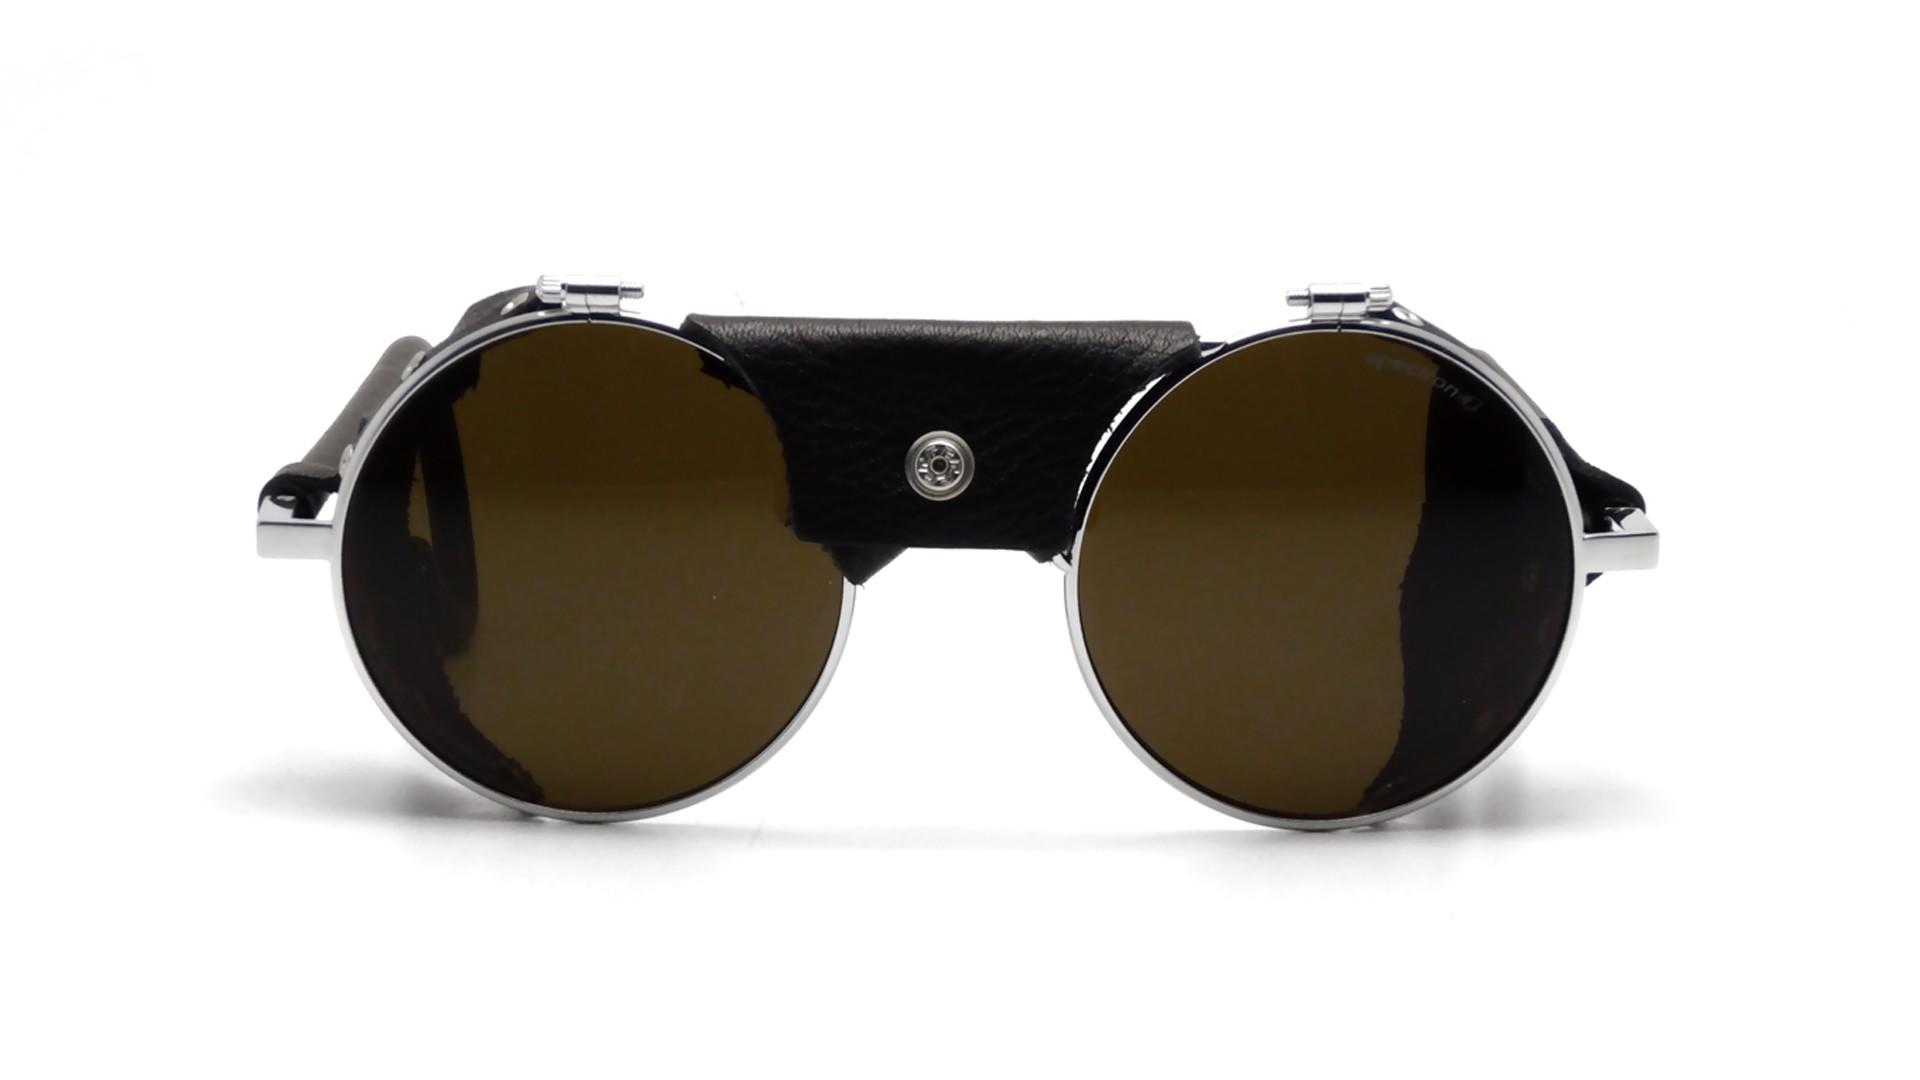 Sunglasses Julbo Vermont Chrome Classic Silver J010 20 125